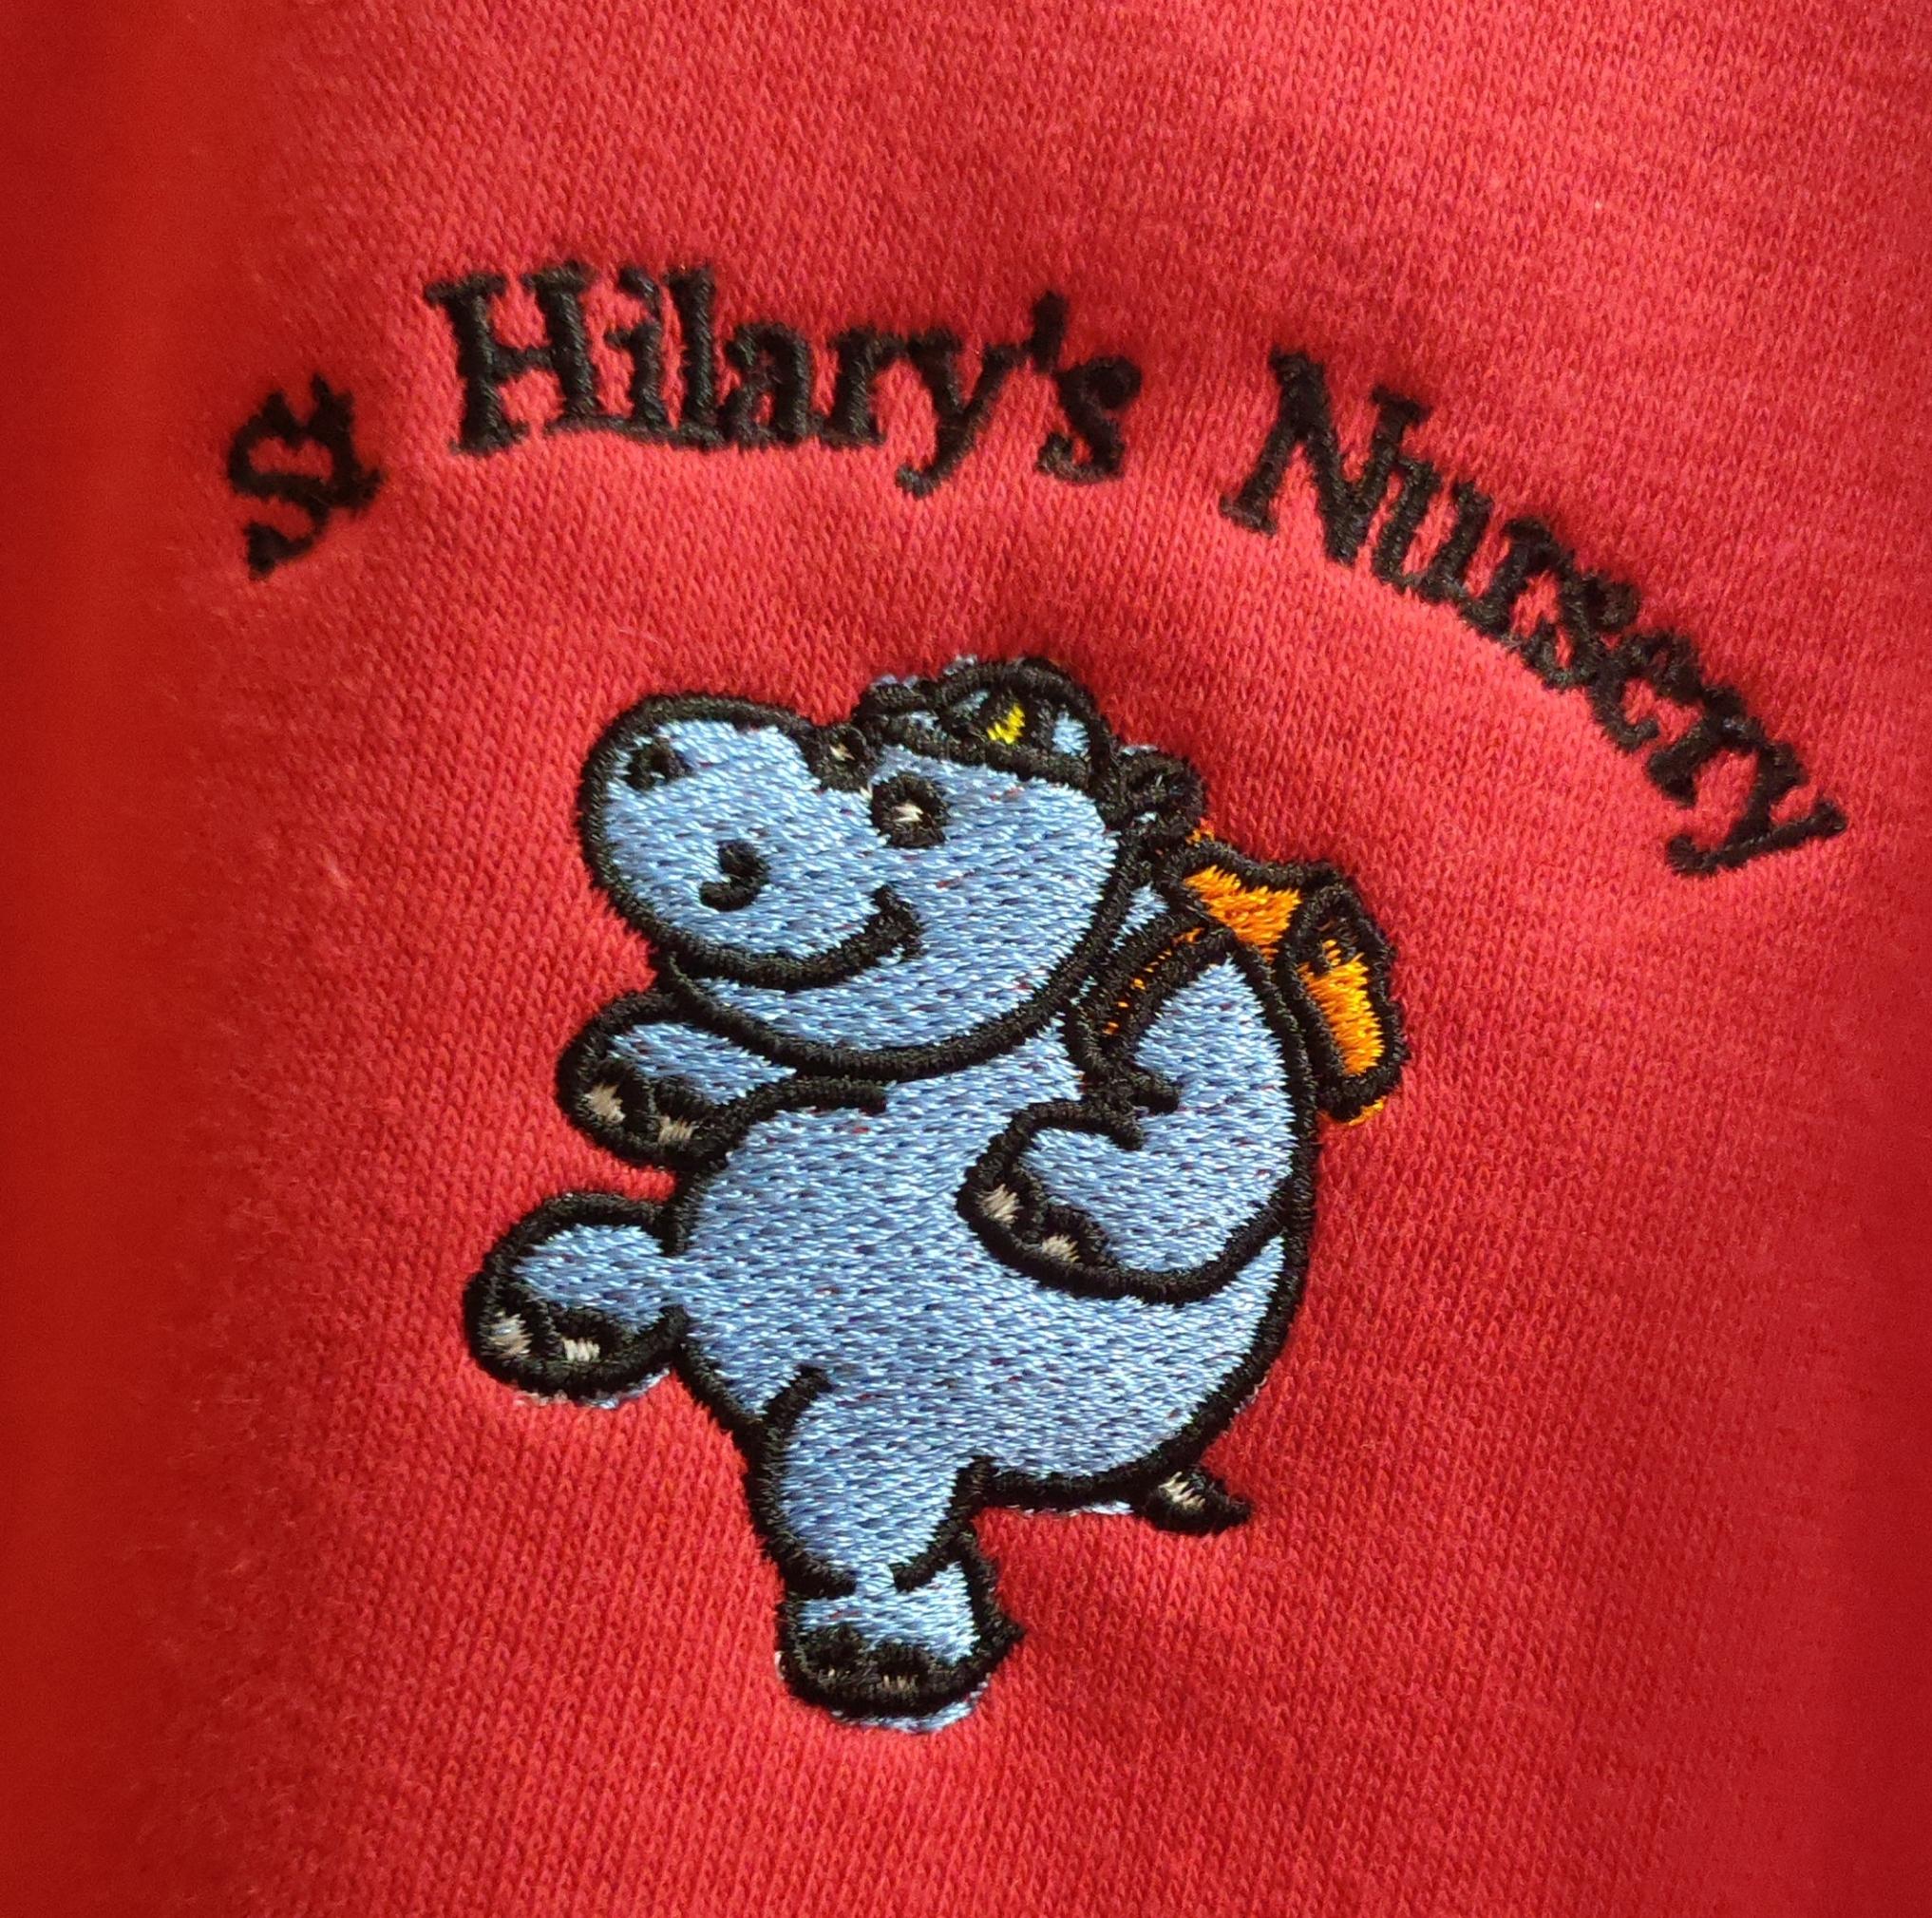 St. Hilary's Nursery (East Kilbride)